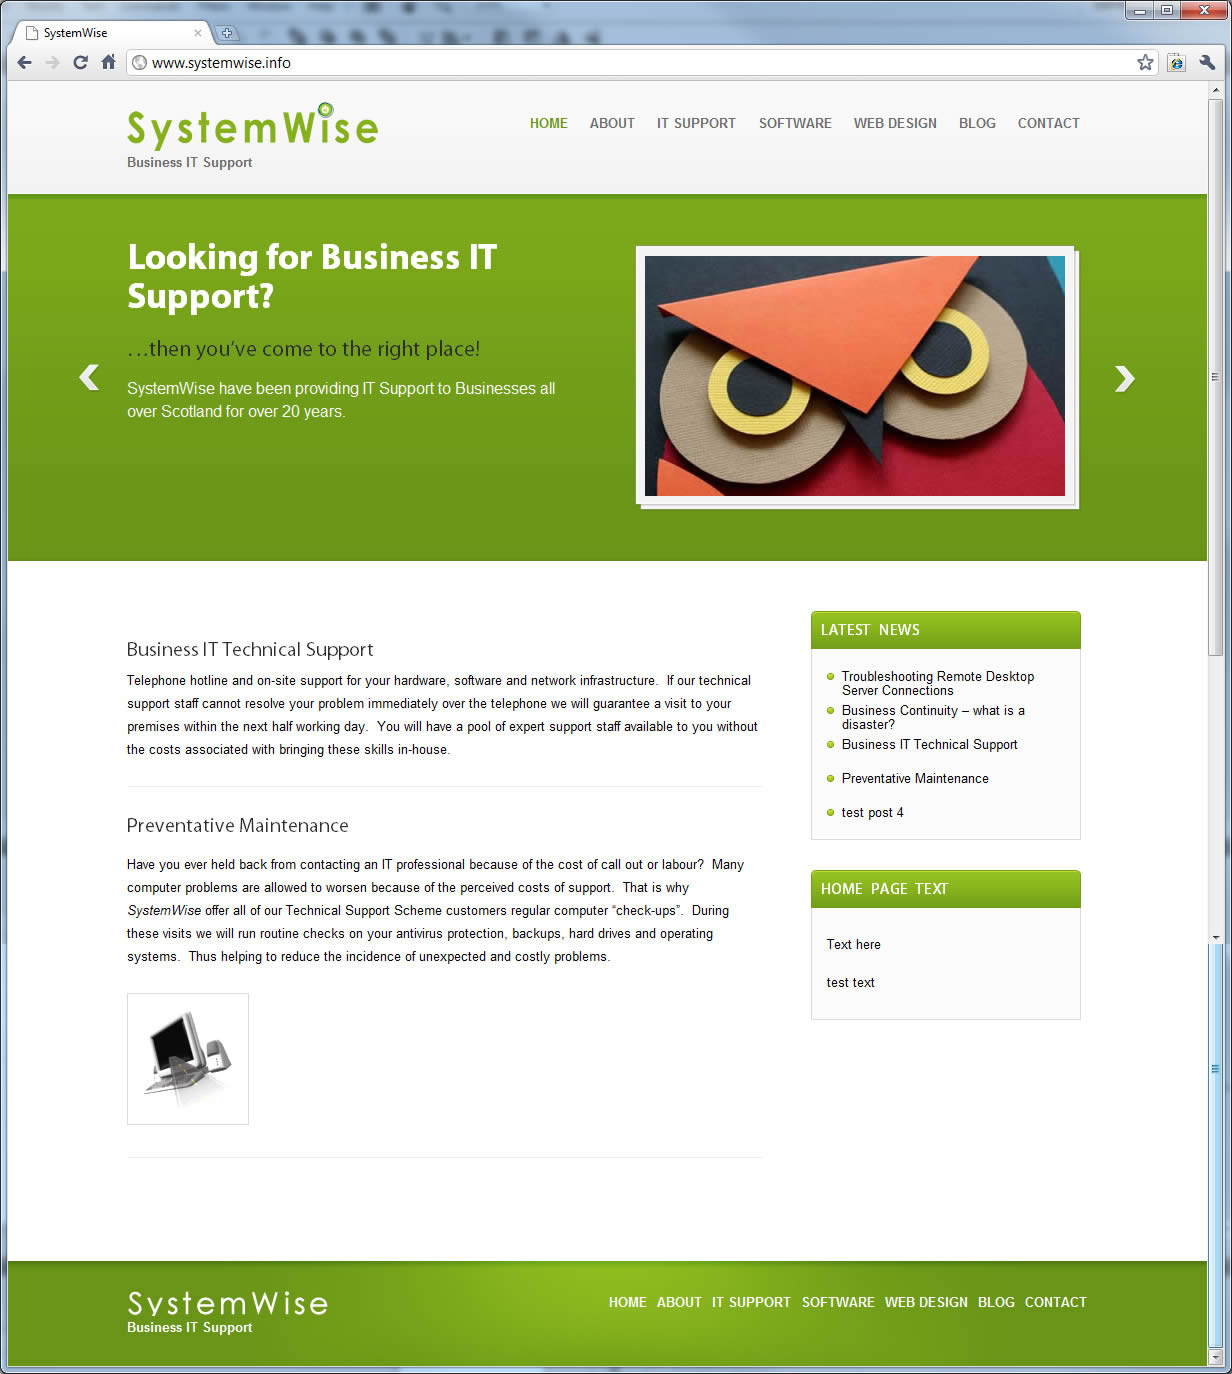 SystemWise Website